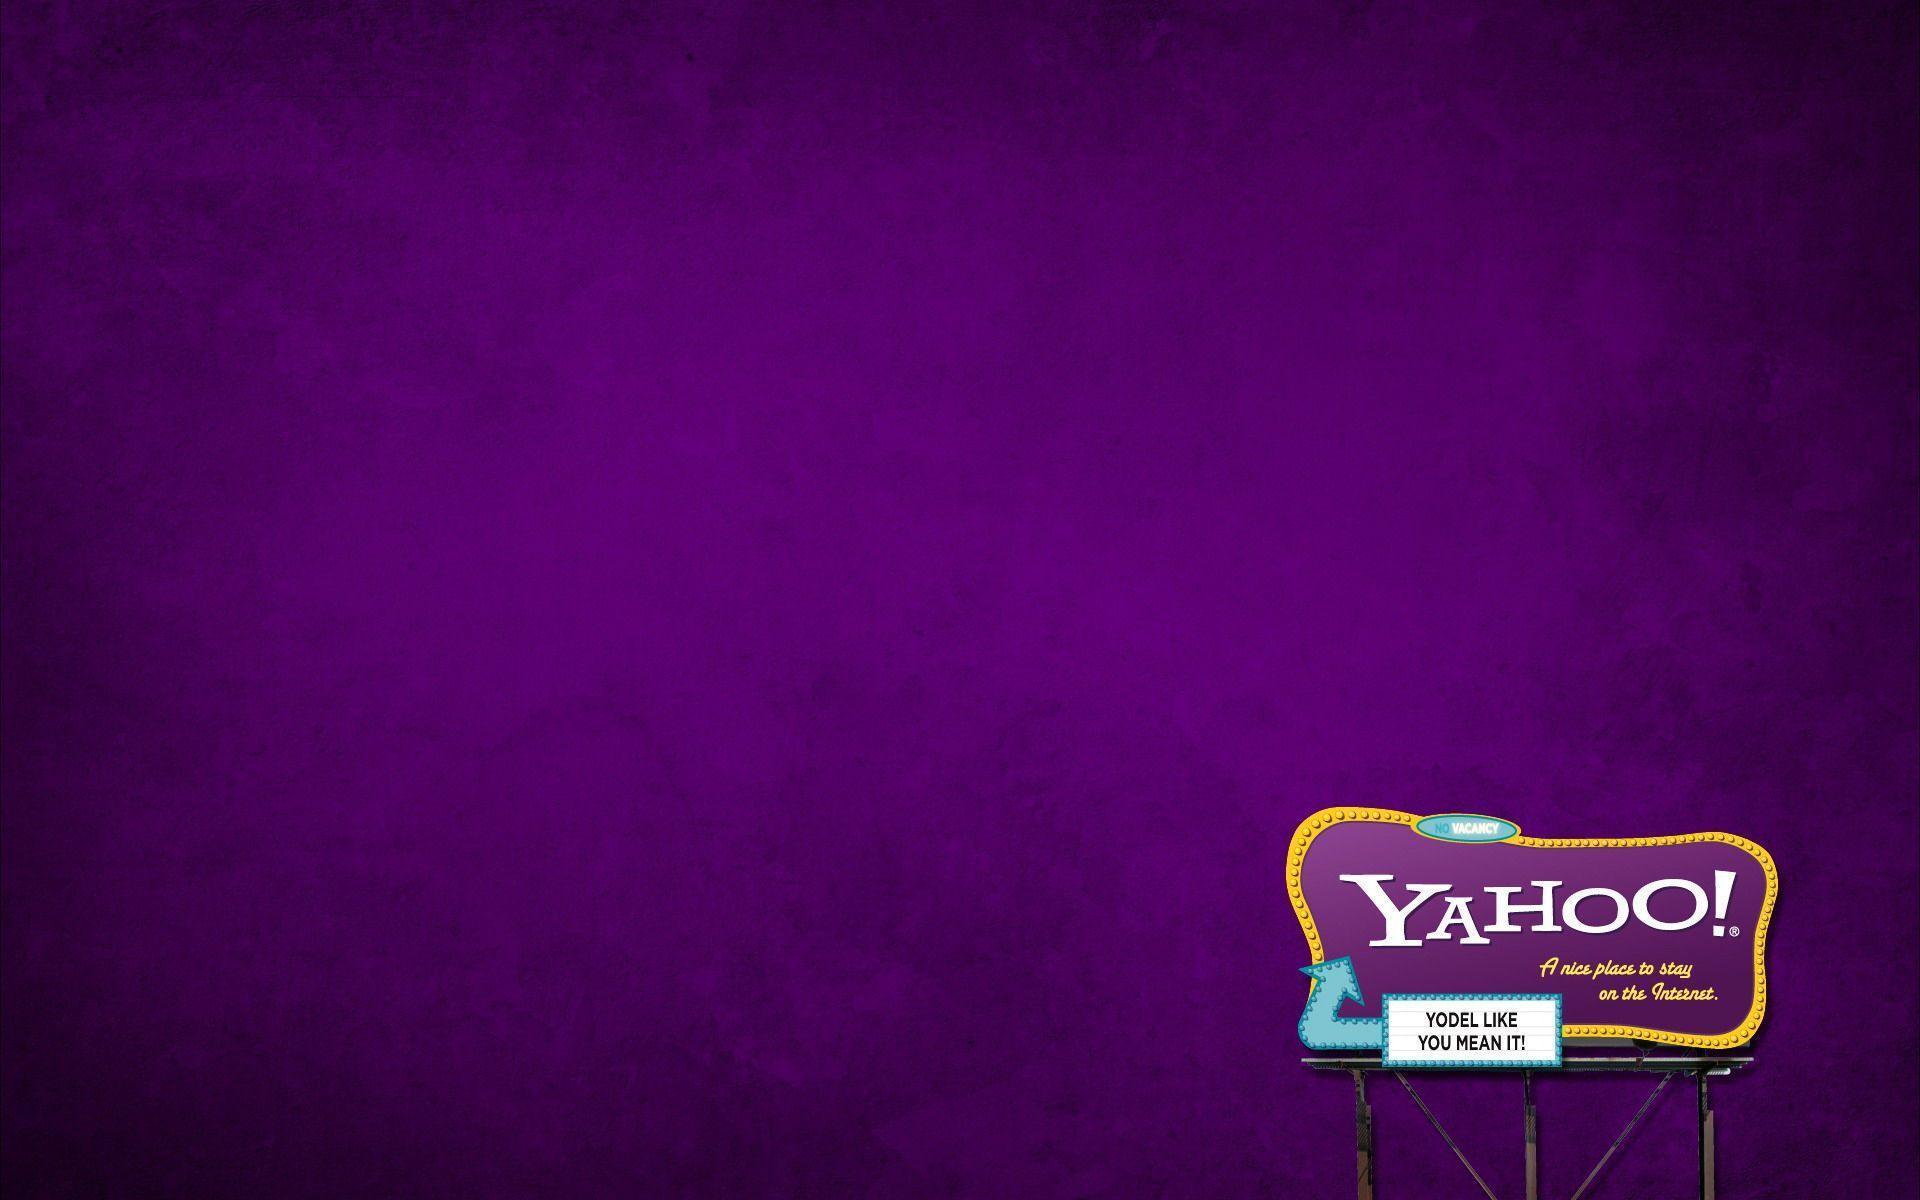 Yahoo Wallpapers - Full HD wallpaper search